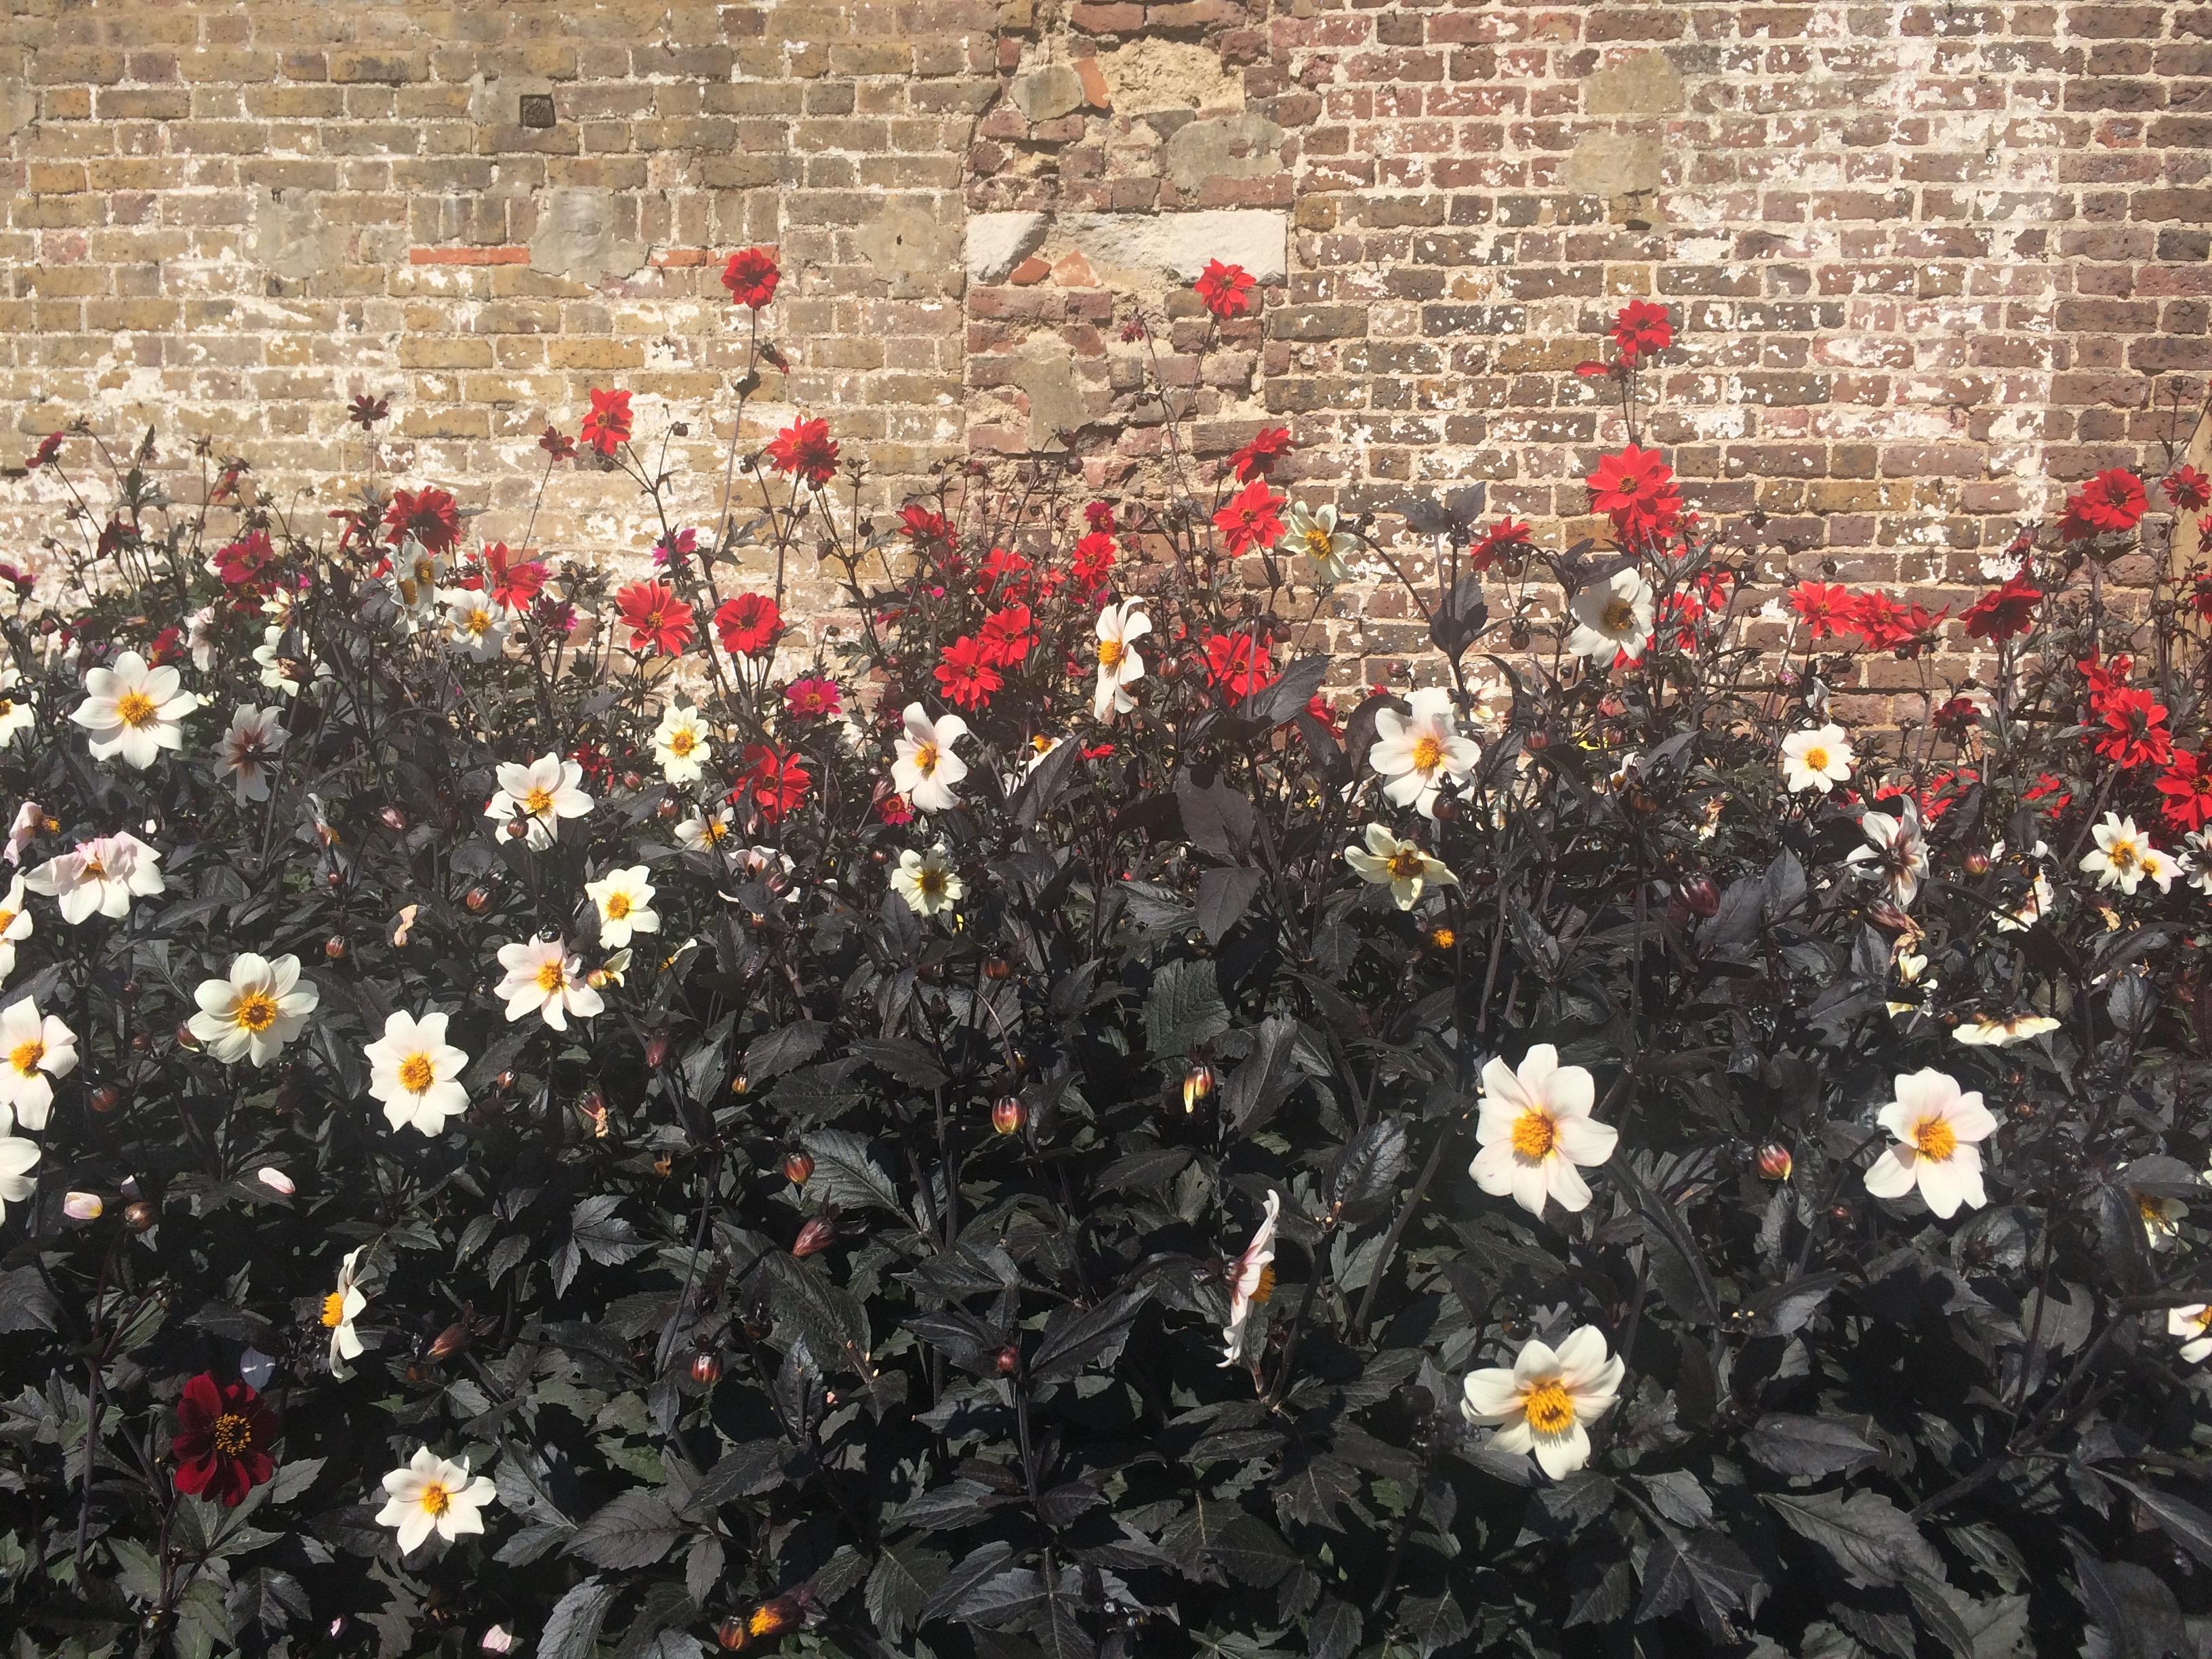 fulham-palace-garden